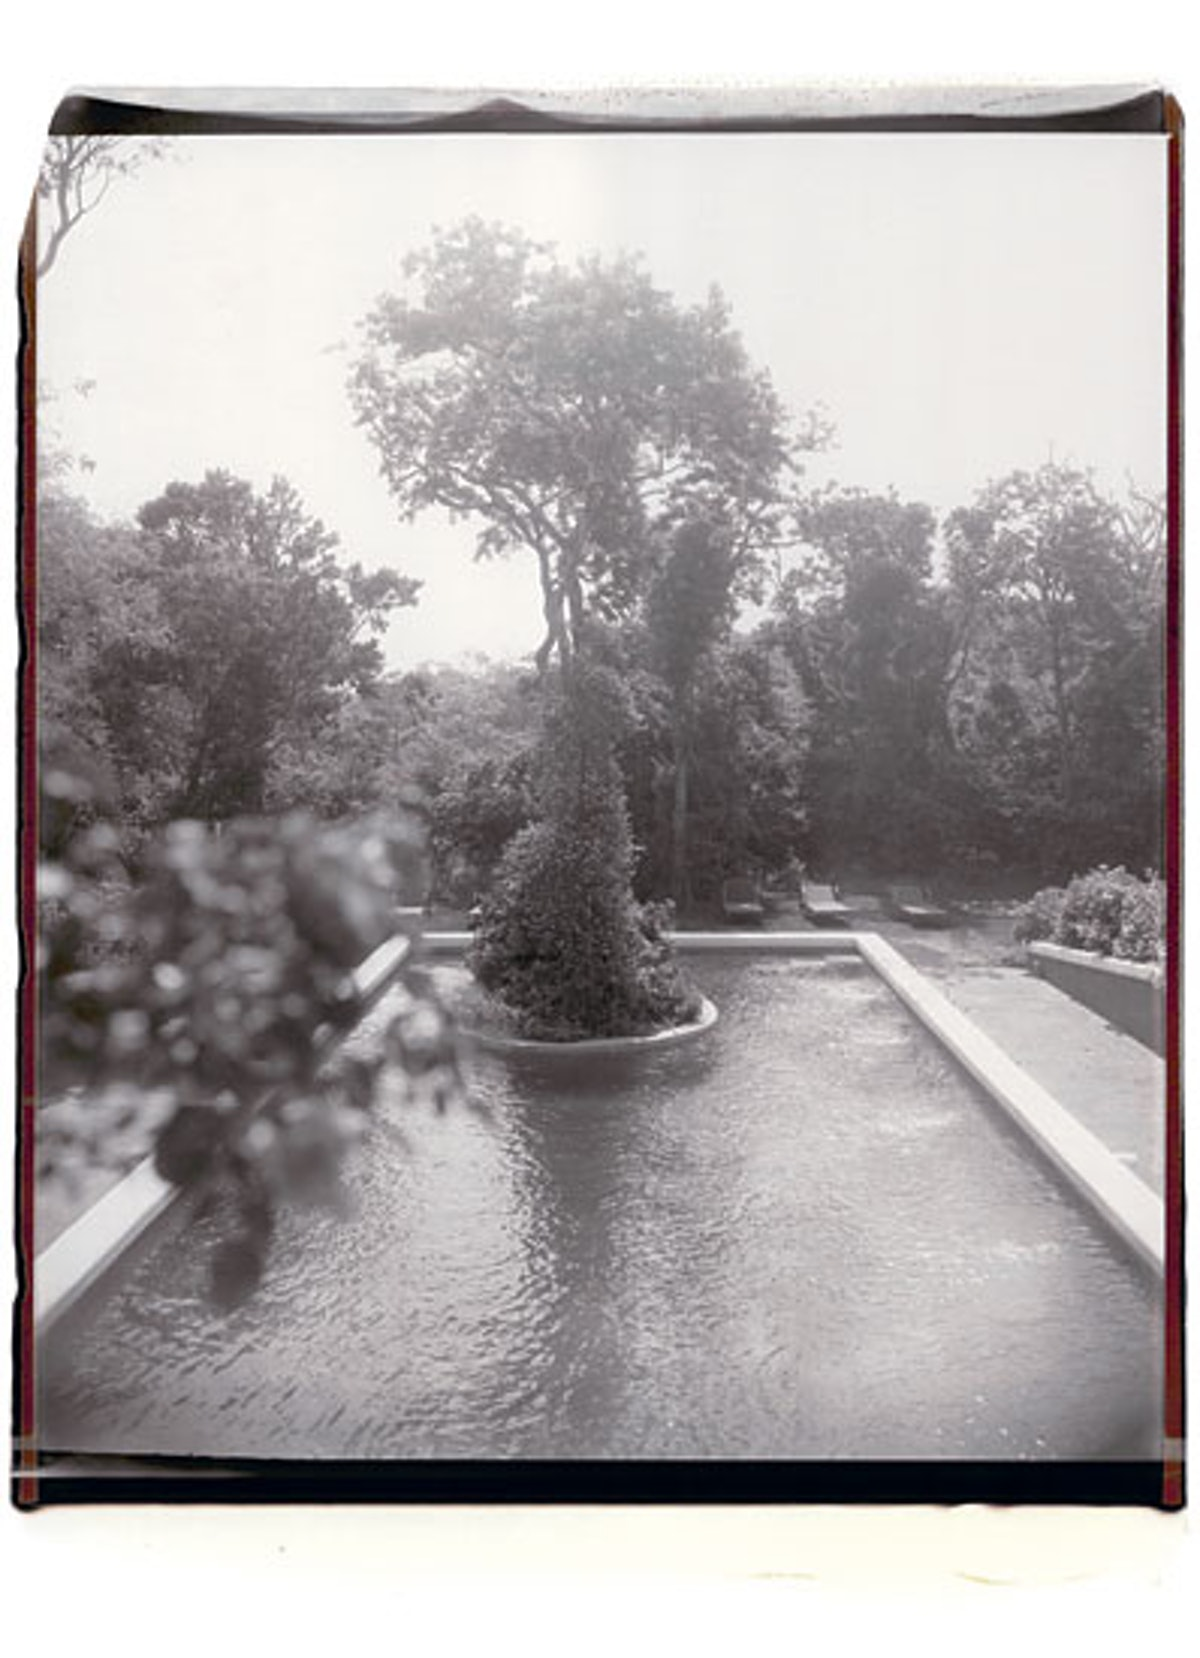 arss-pools-reflections-06-v.jpg